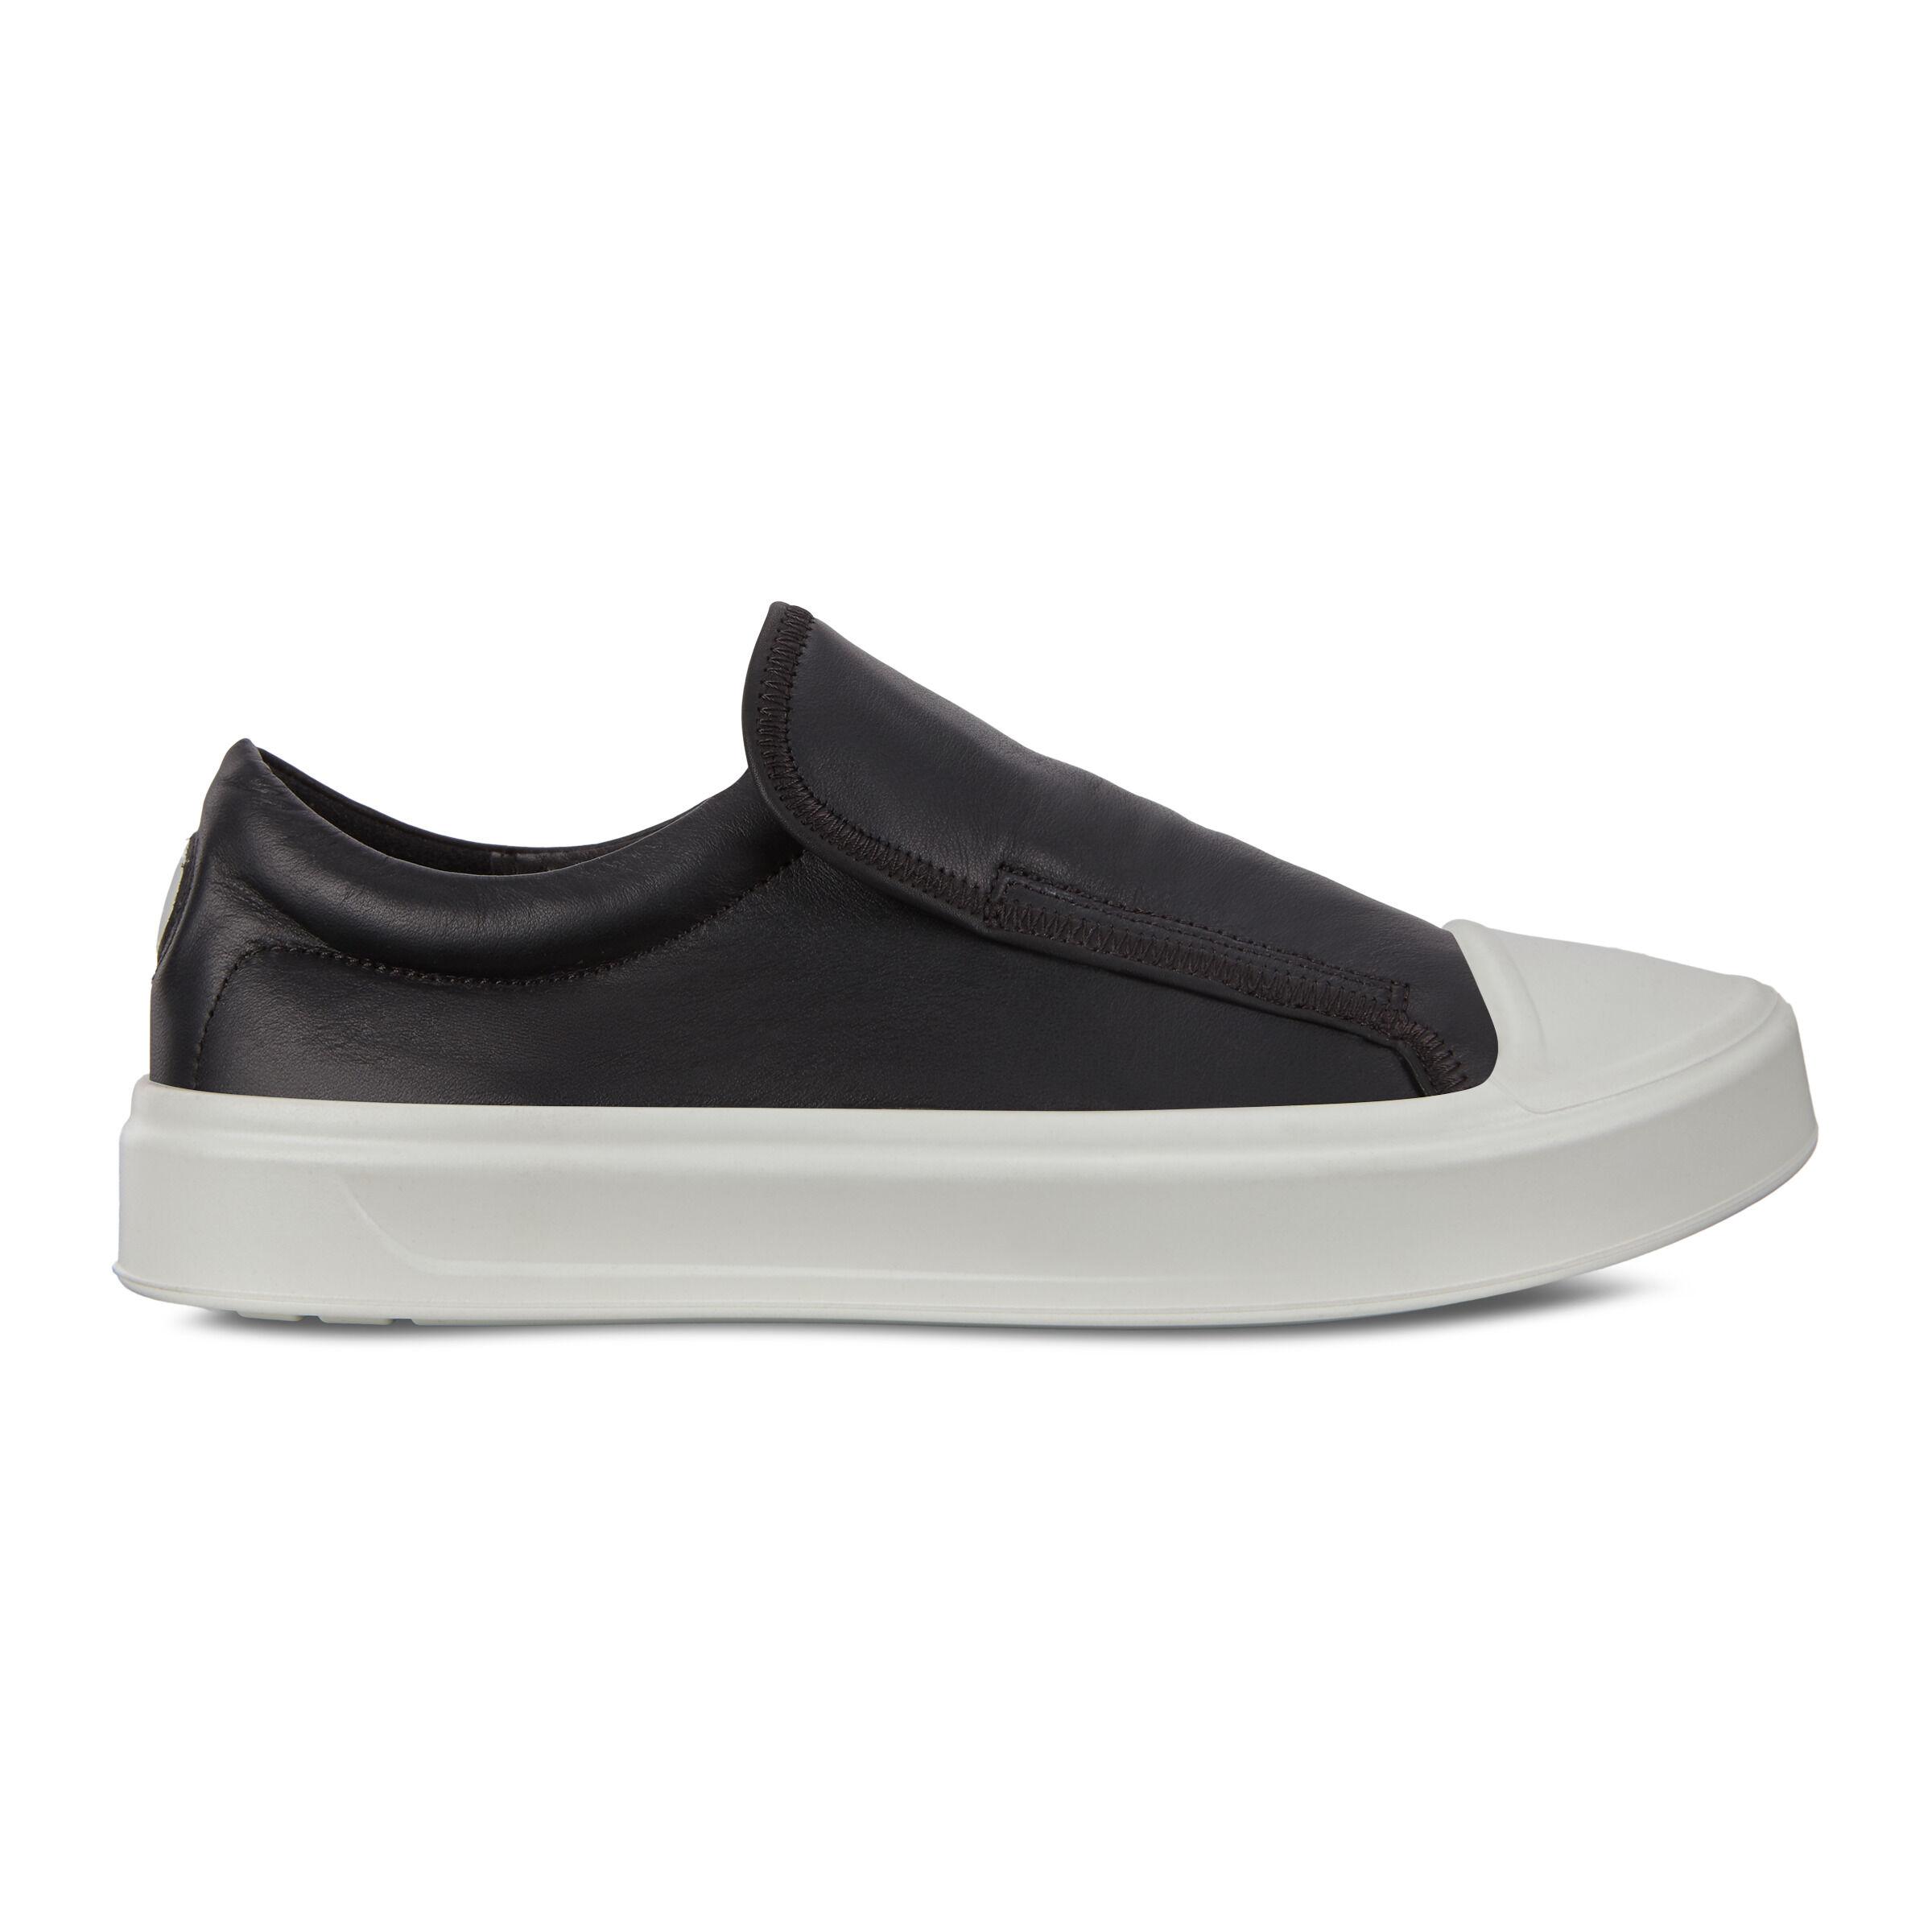 ECCO Flexure T-cap Womens Slip-on Sneakers